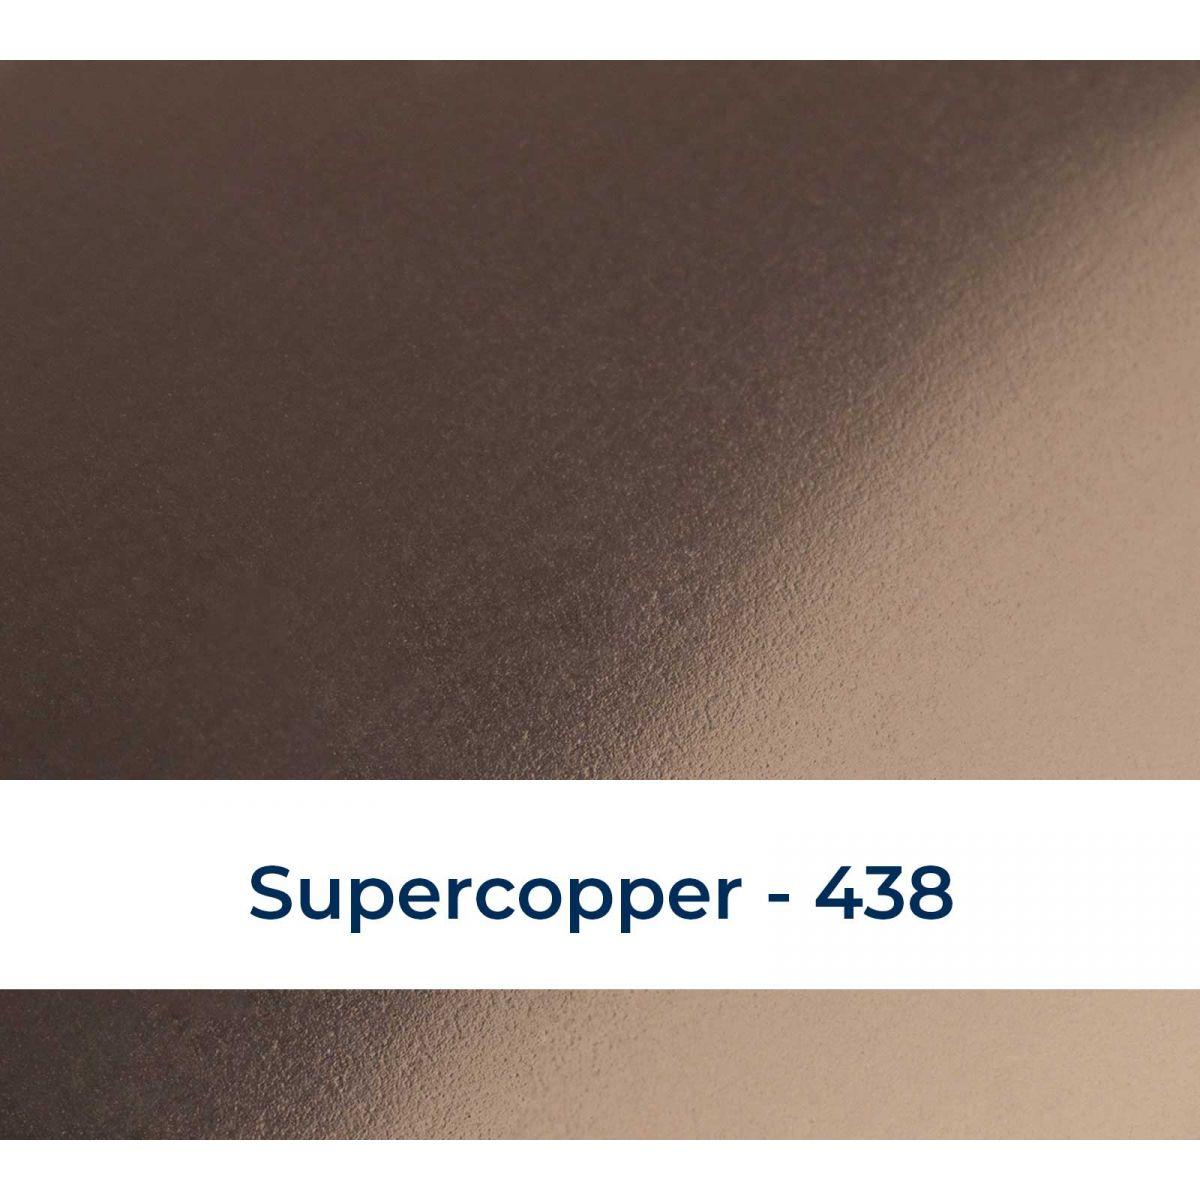 Metallic supercopper 438